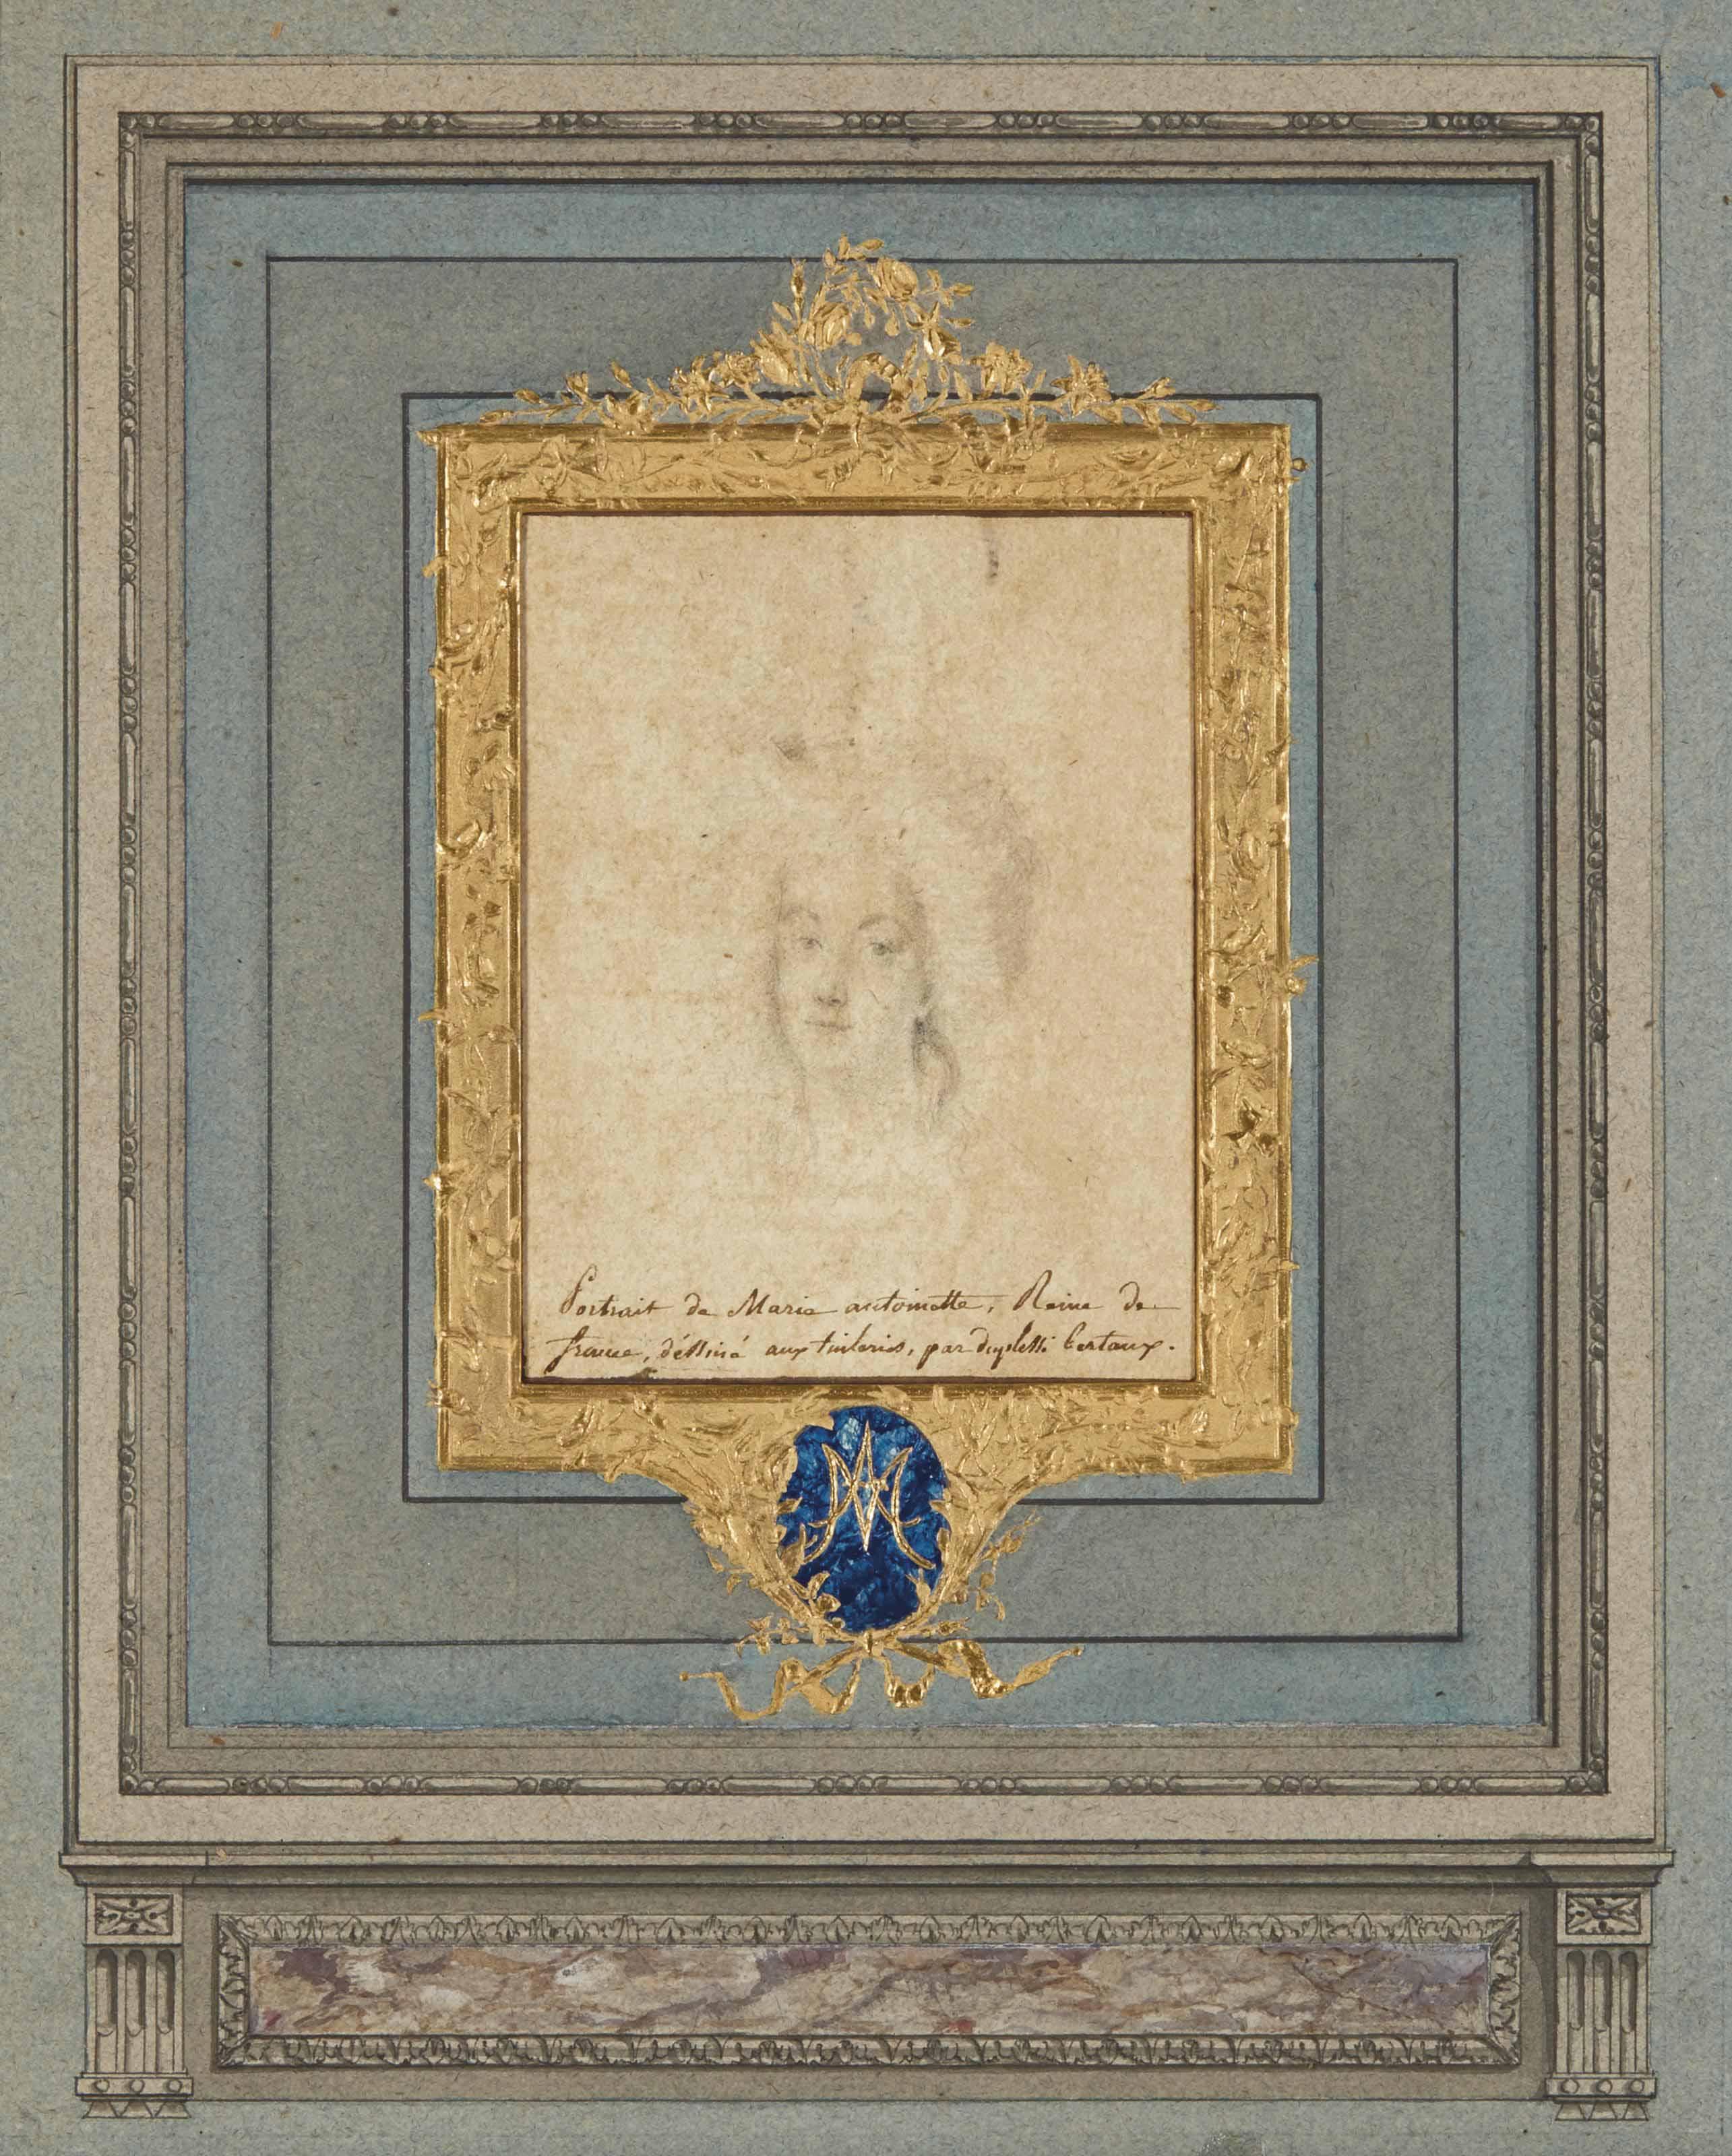 Portrait de Marie-Antoinette en buste